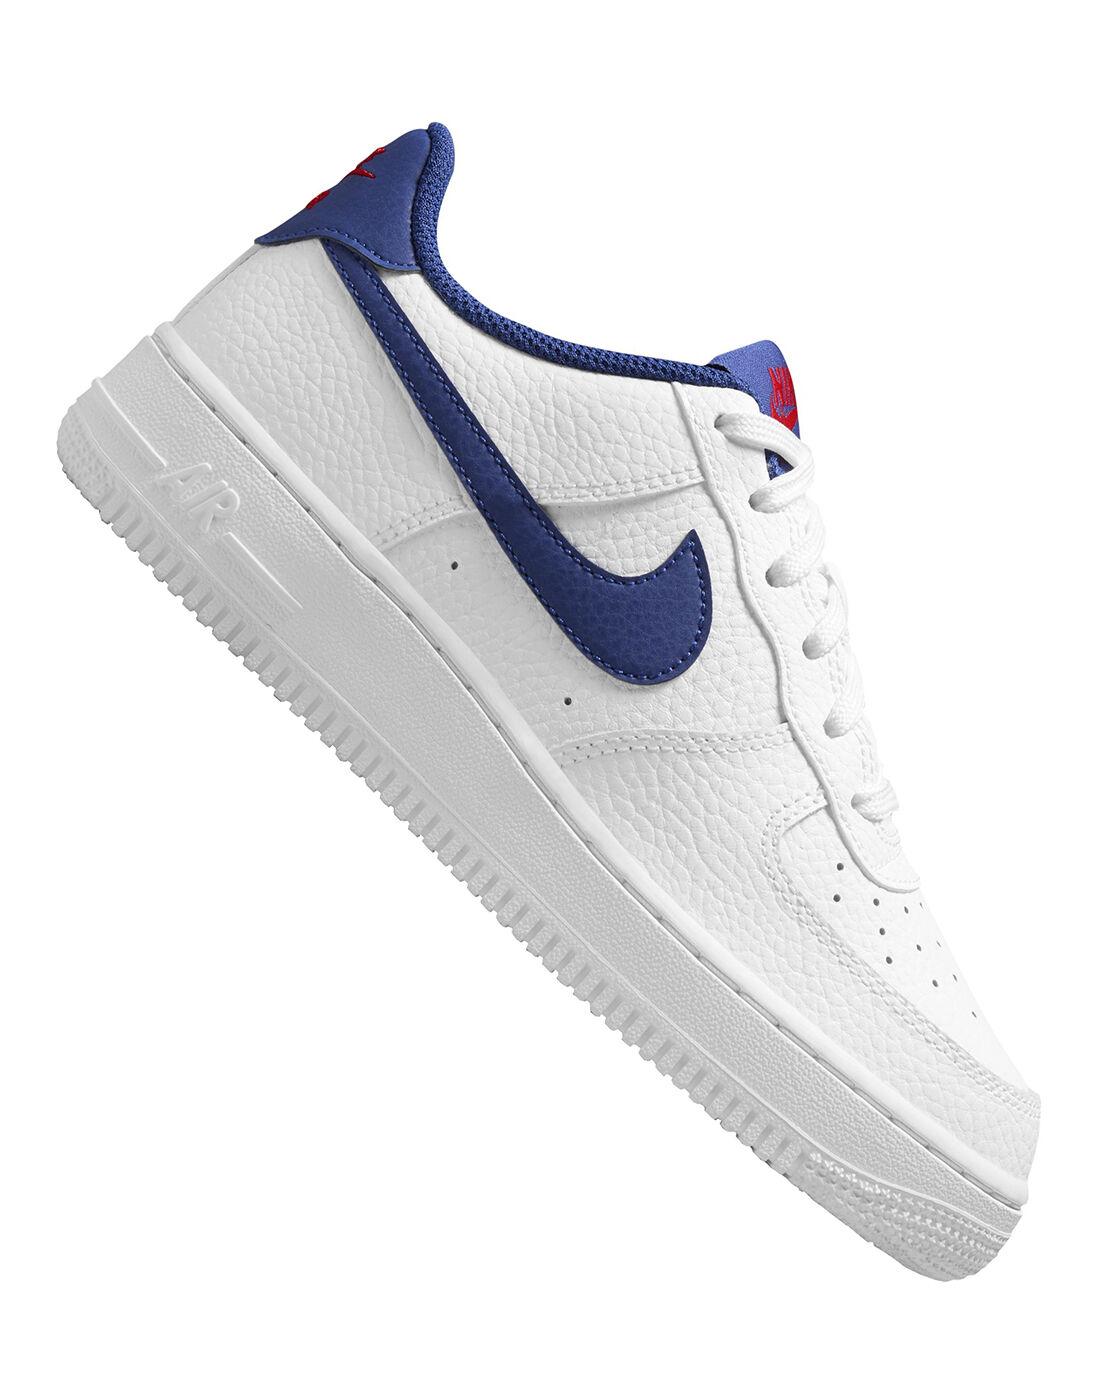 Nike adidas jogginghose amazon shoes sale store coupons   Older Kids nike huarache reddit girls on sale craigslist ebay